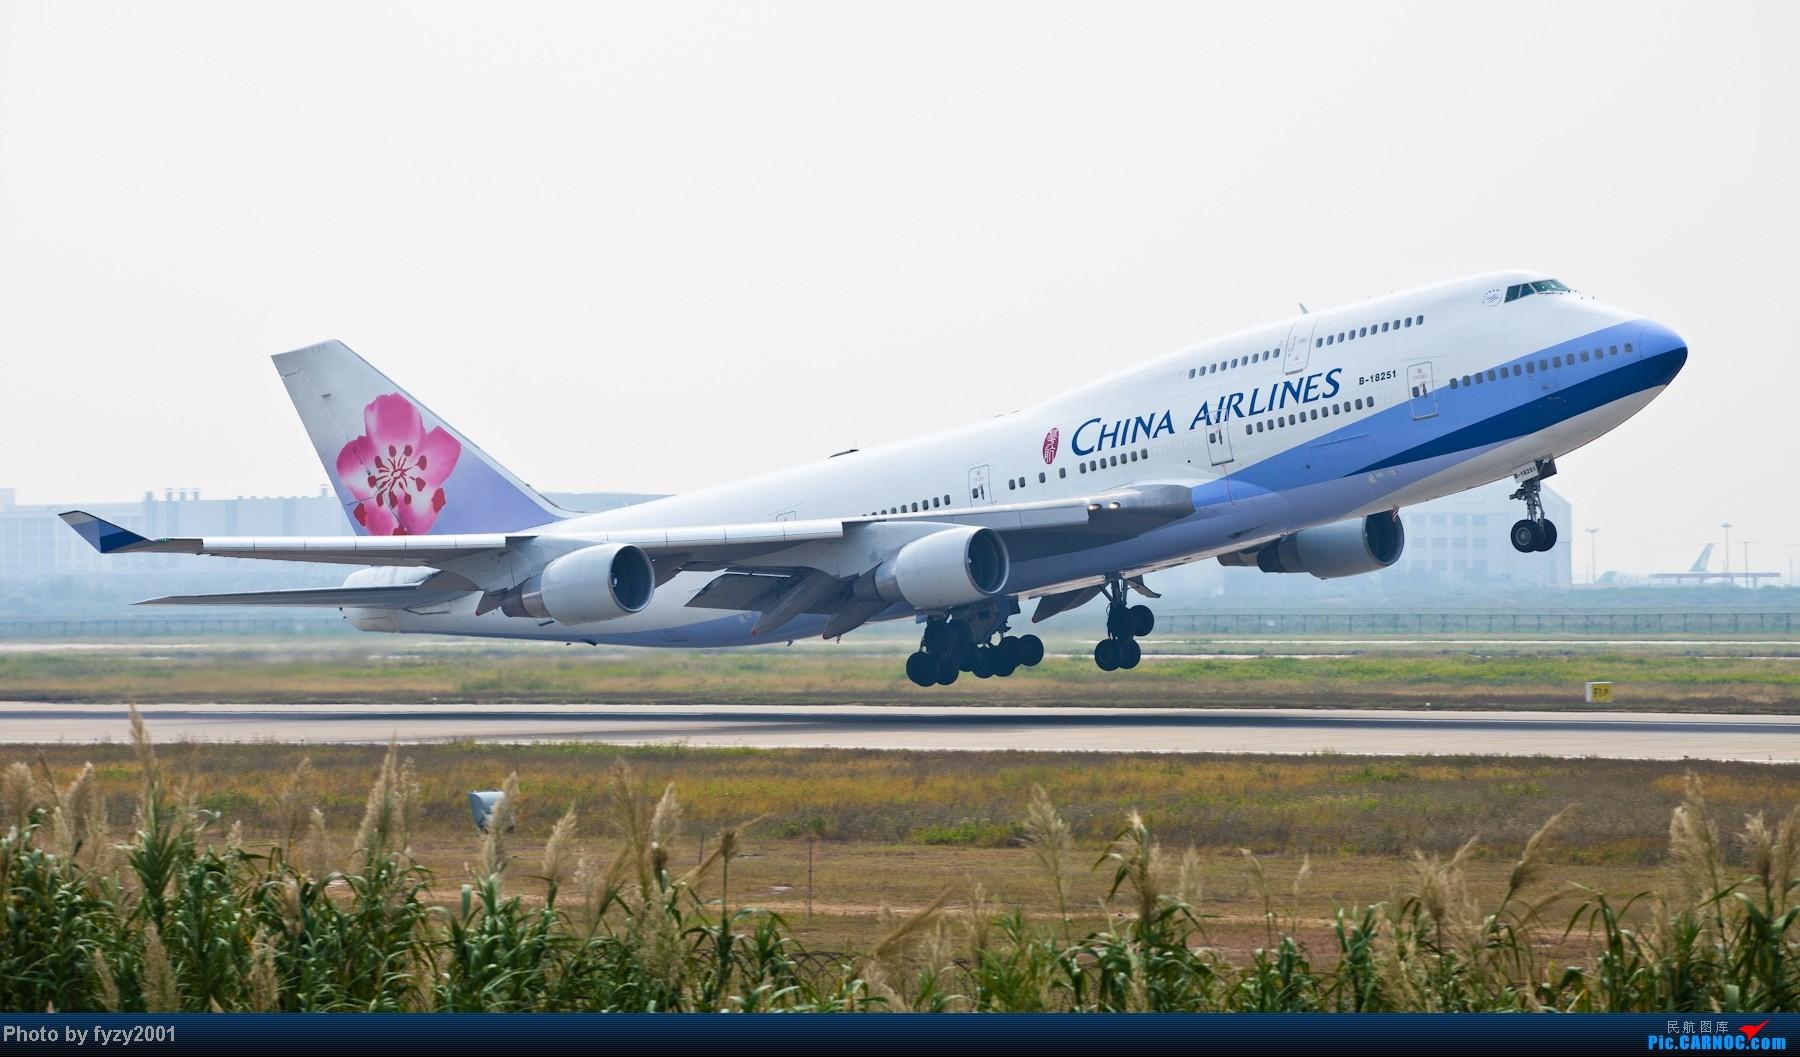 Re:[原创][无锡西站]长假PVG蹲守~~~~只发大图,多图杀猫~~~~ BOEING 747-400 B-18251 中国上海浦东机场